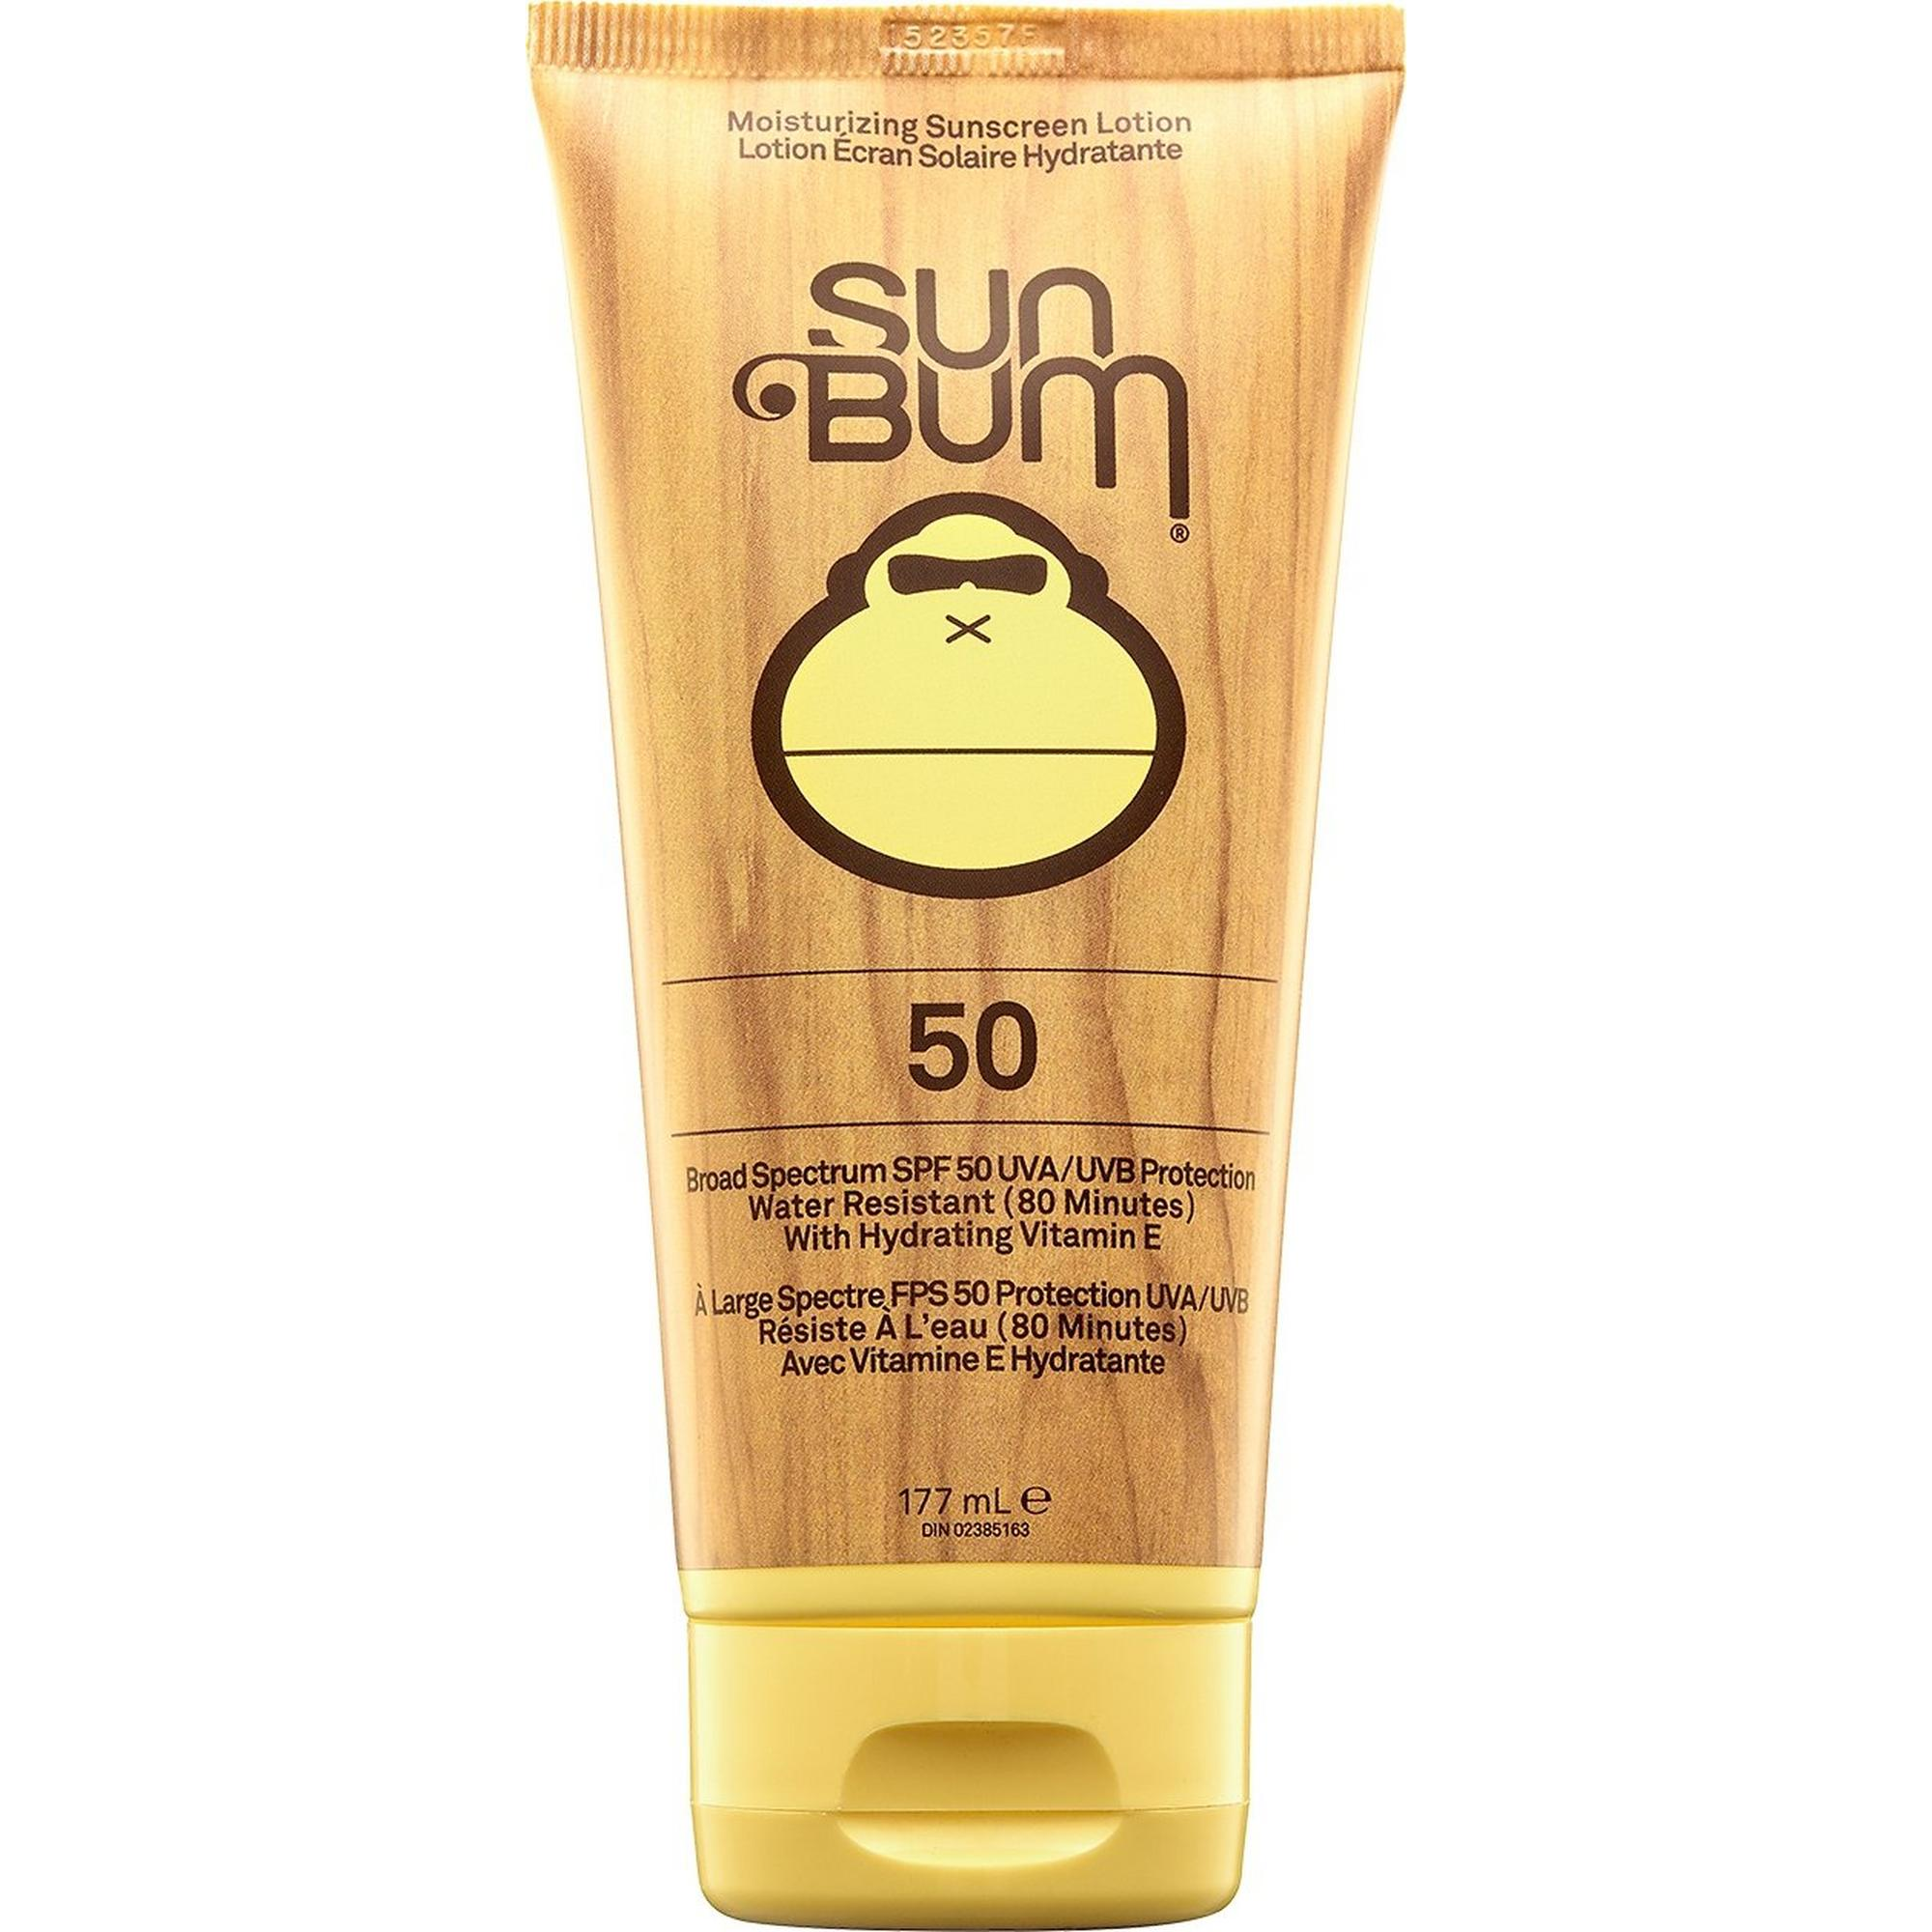 SPF 50 Sunscreen Lotion